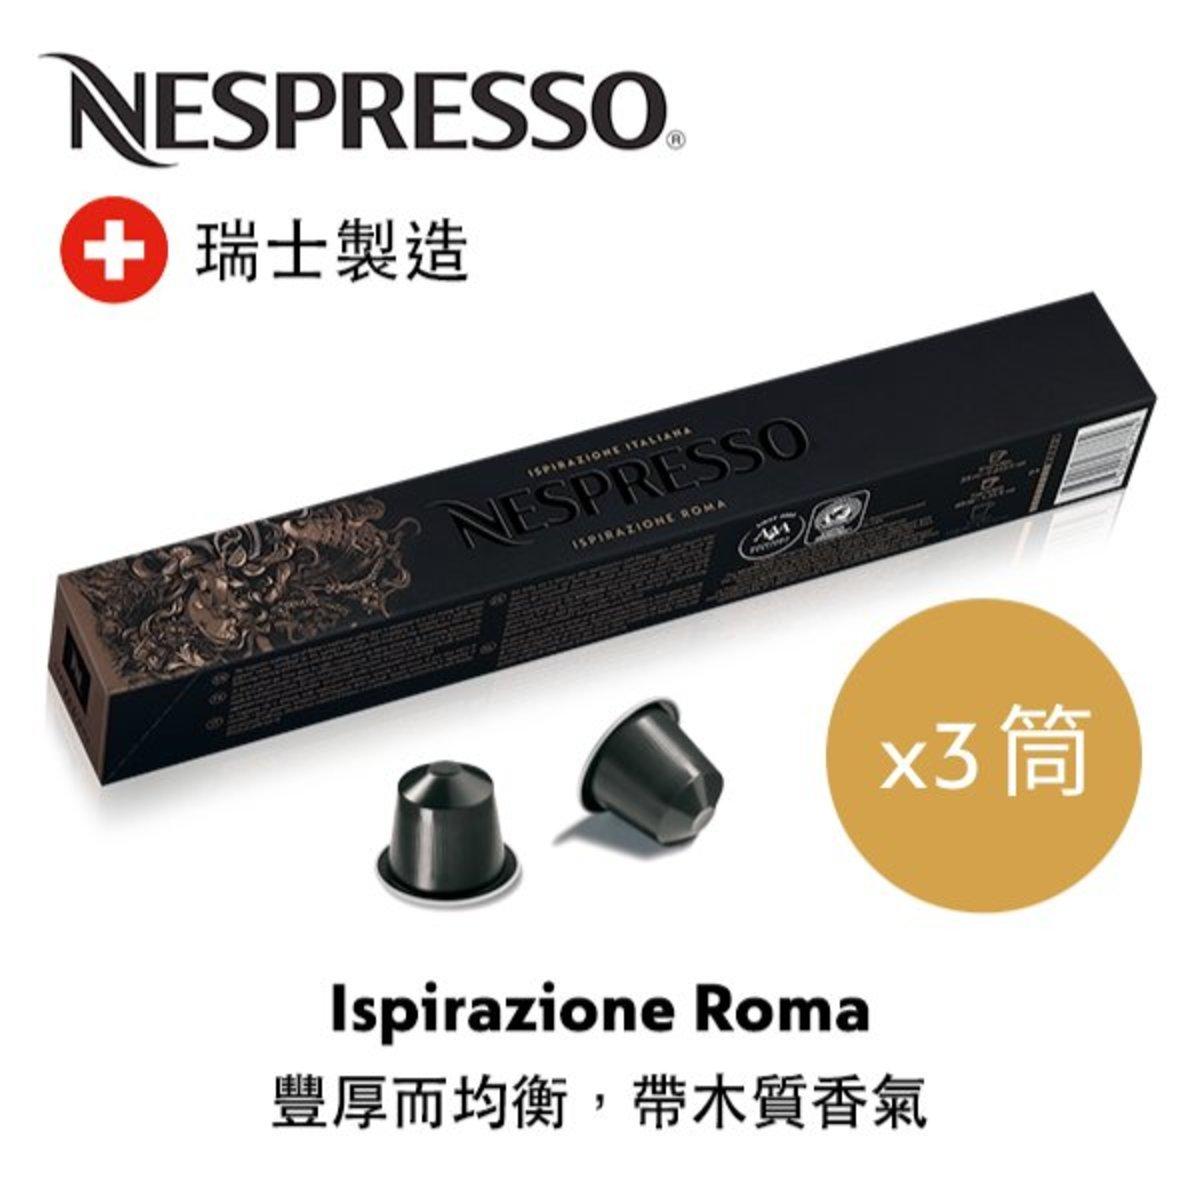 Ispirazione Roma Coffee Capsules x 3 sleeves- Intenso (10 capsules per sleeve)